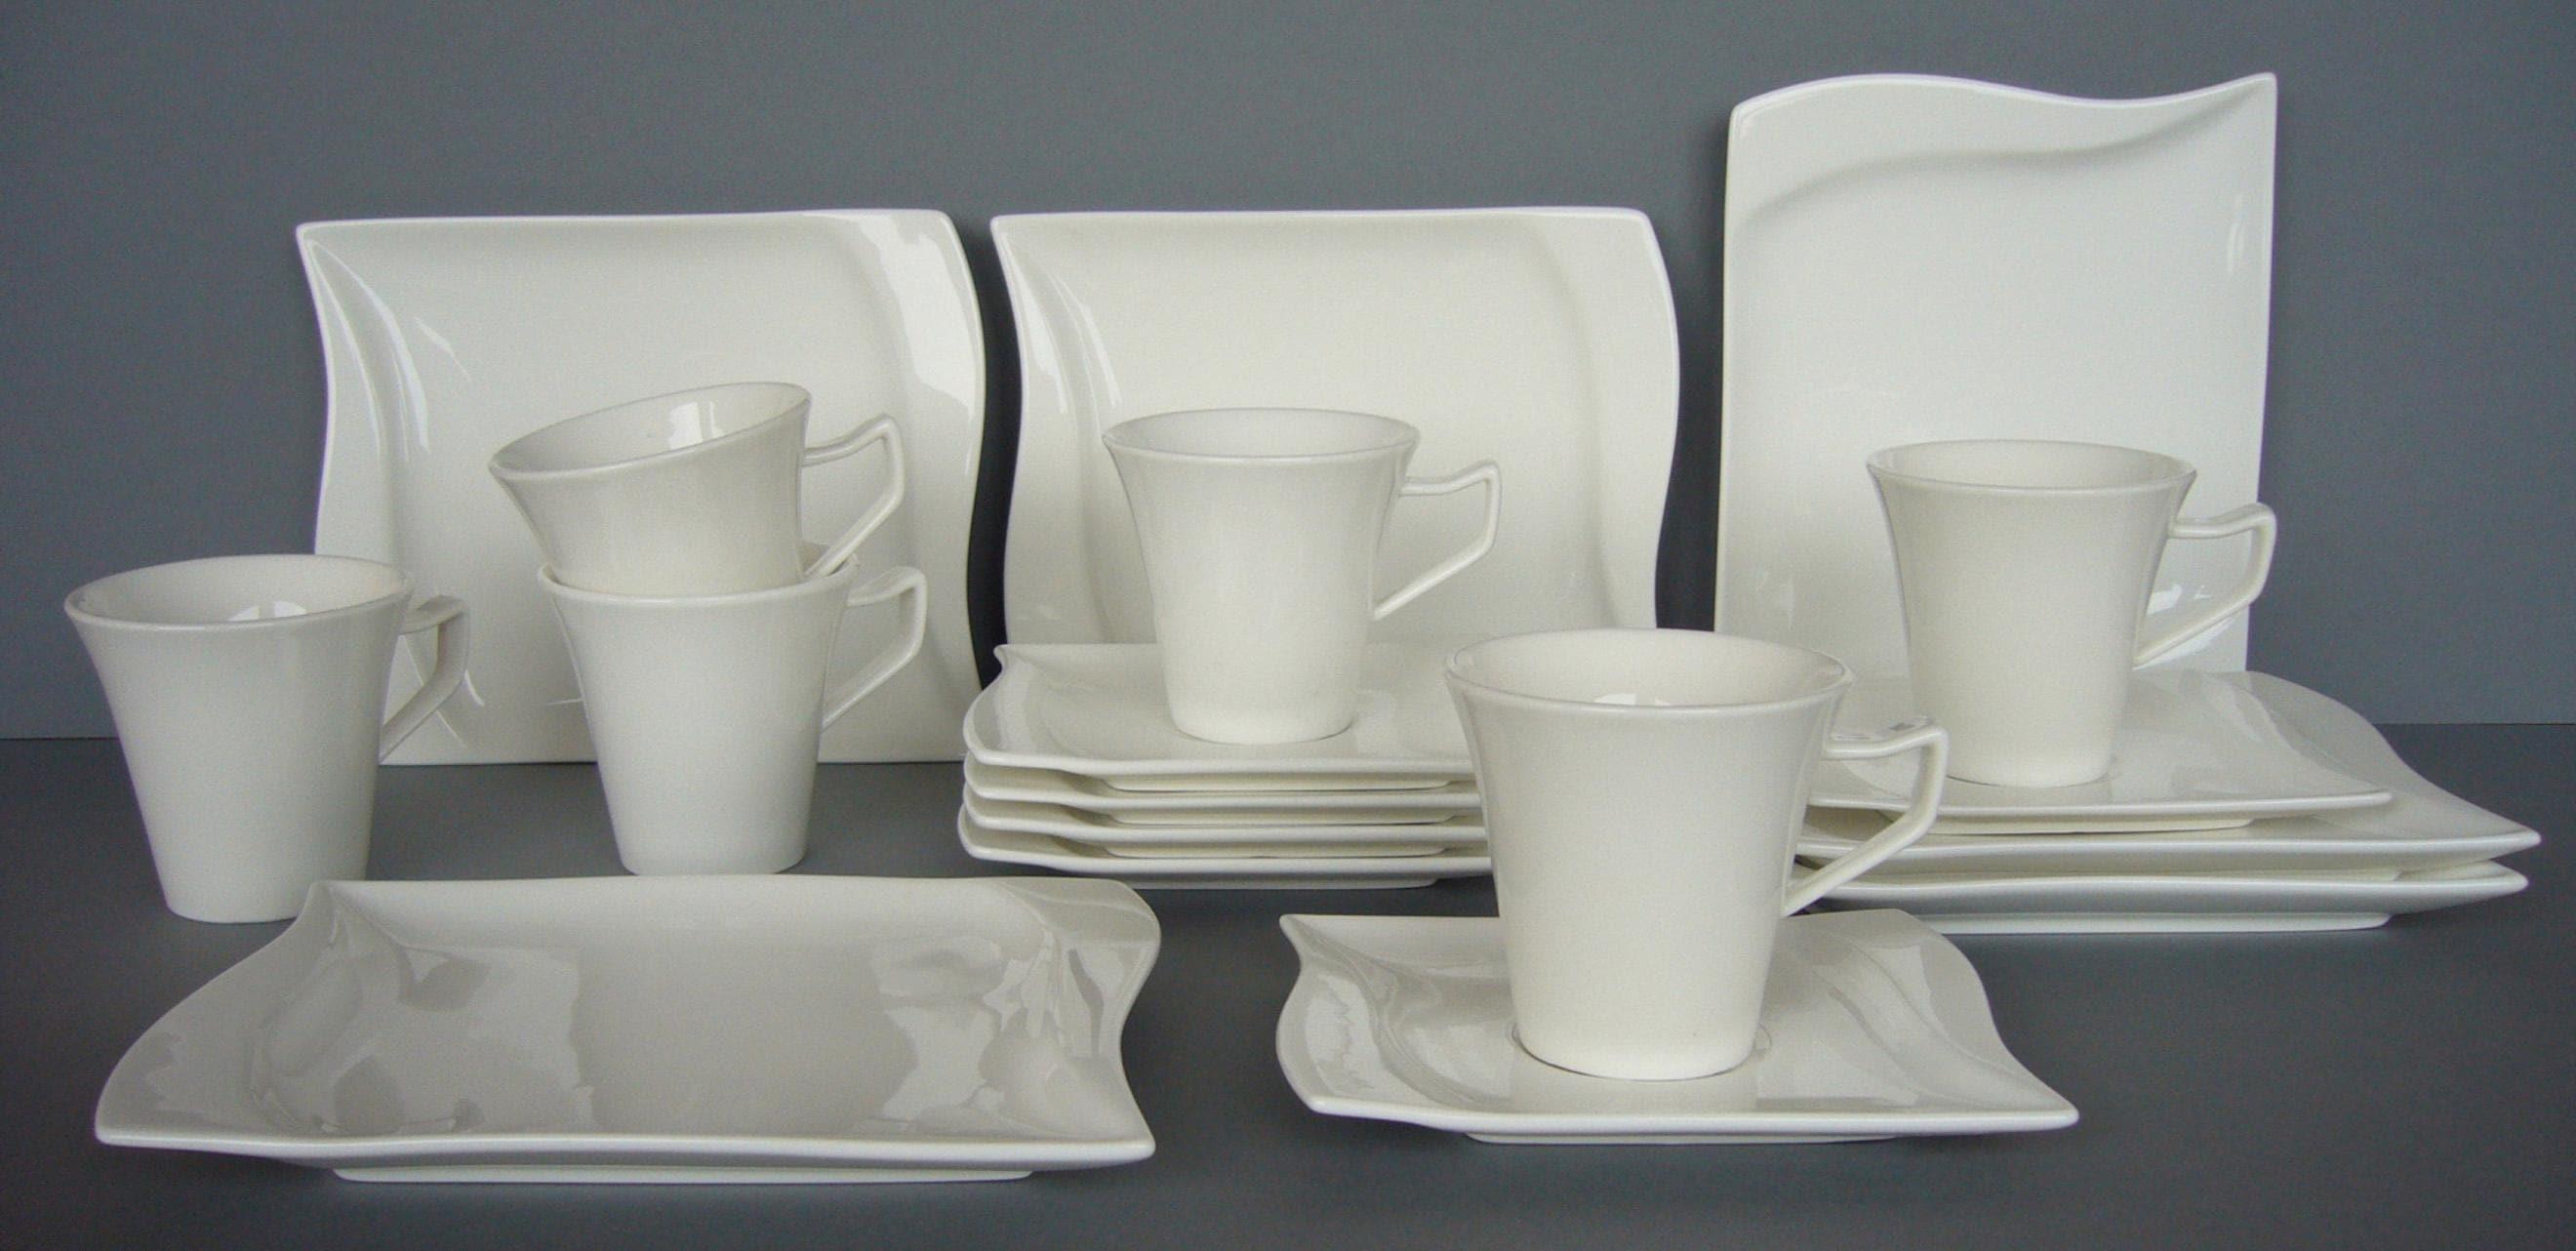 van Well Kaffeeservice Harmony, (Set, 18 tlg.), Mikrowellengeeignet weiß Geschirr-Sets Geschirr, Porzellan Tischaccessoires Haushaltswaren